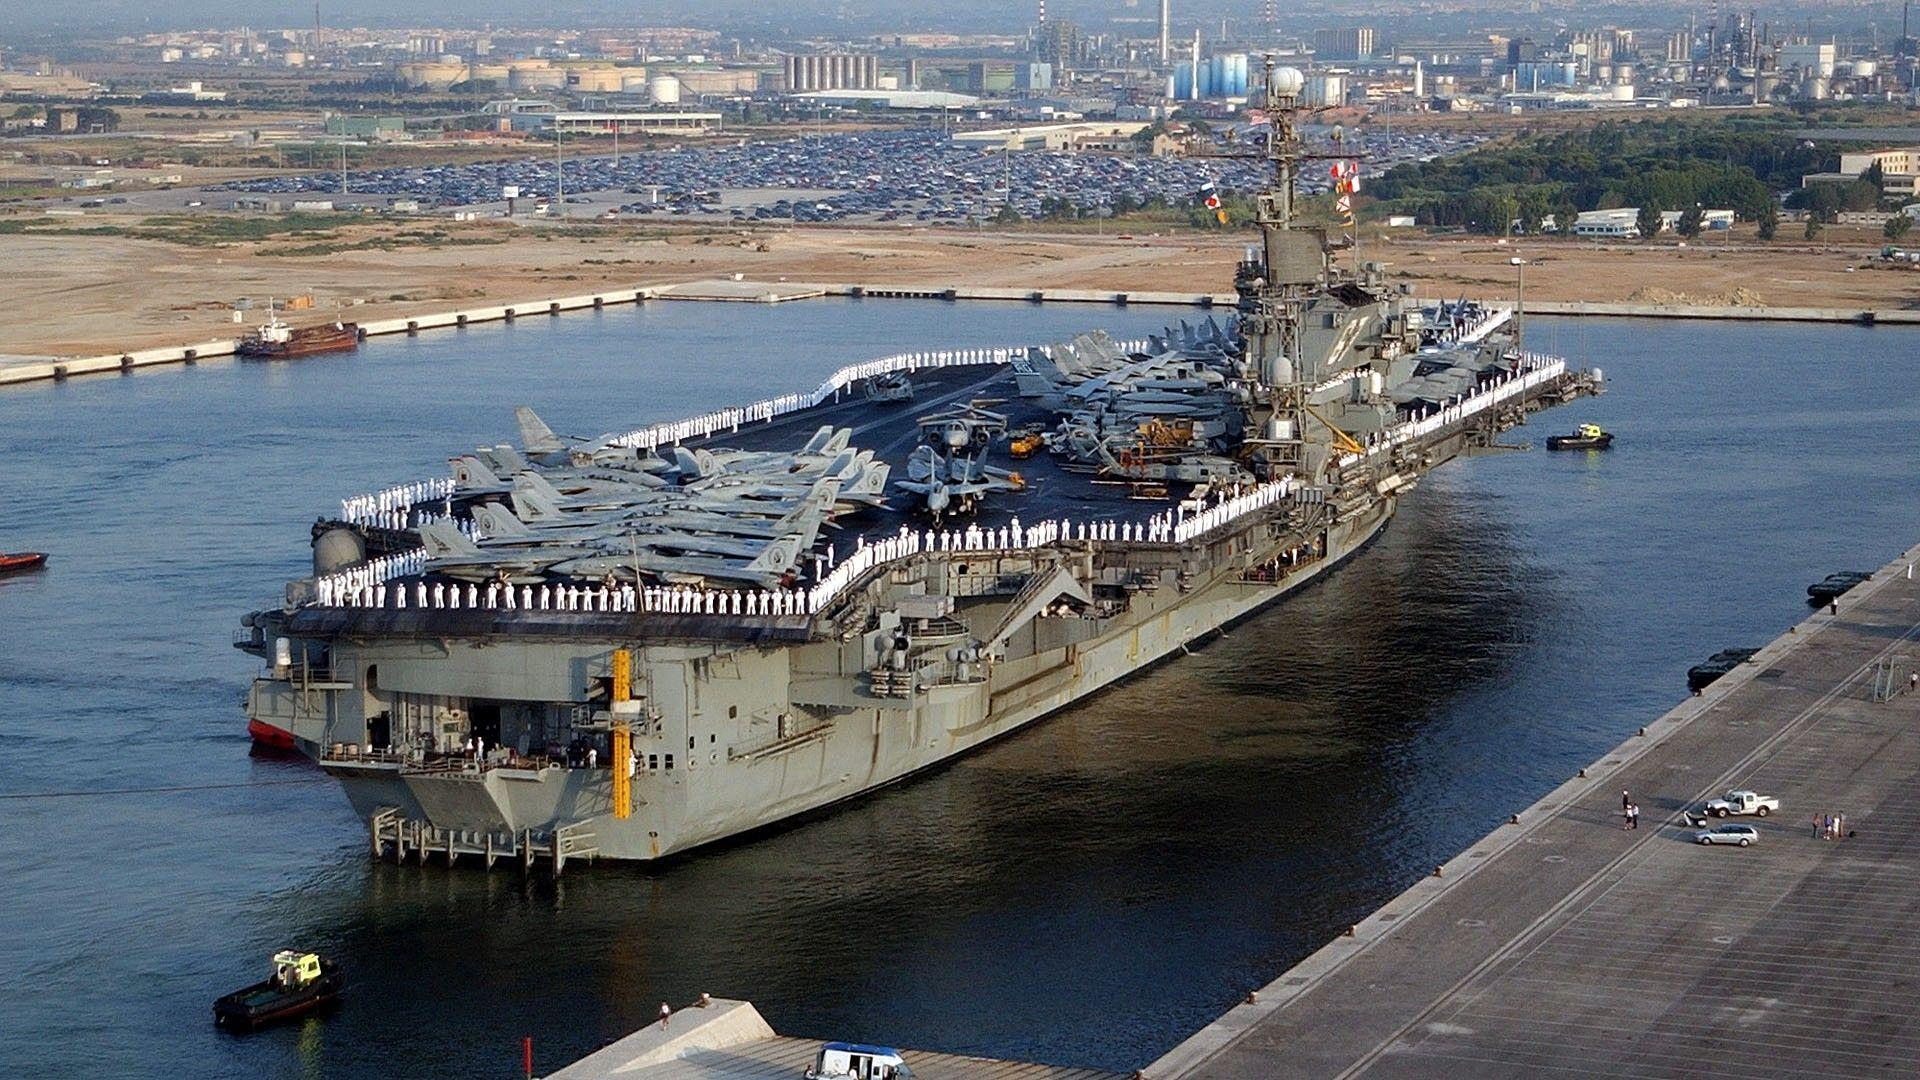 navy wallpaper 1440x900 ships - photo #41